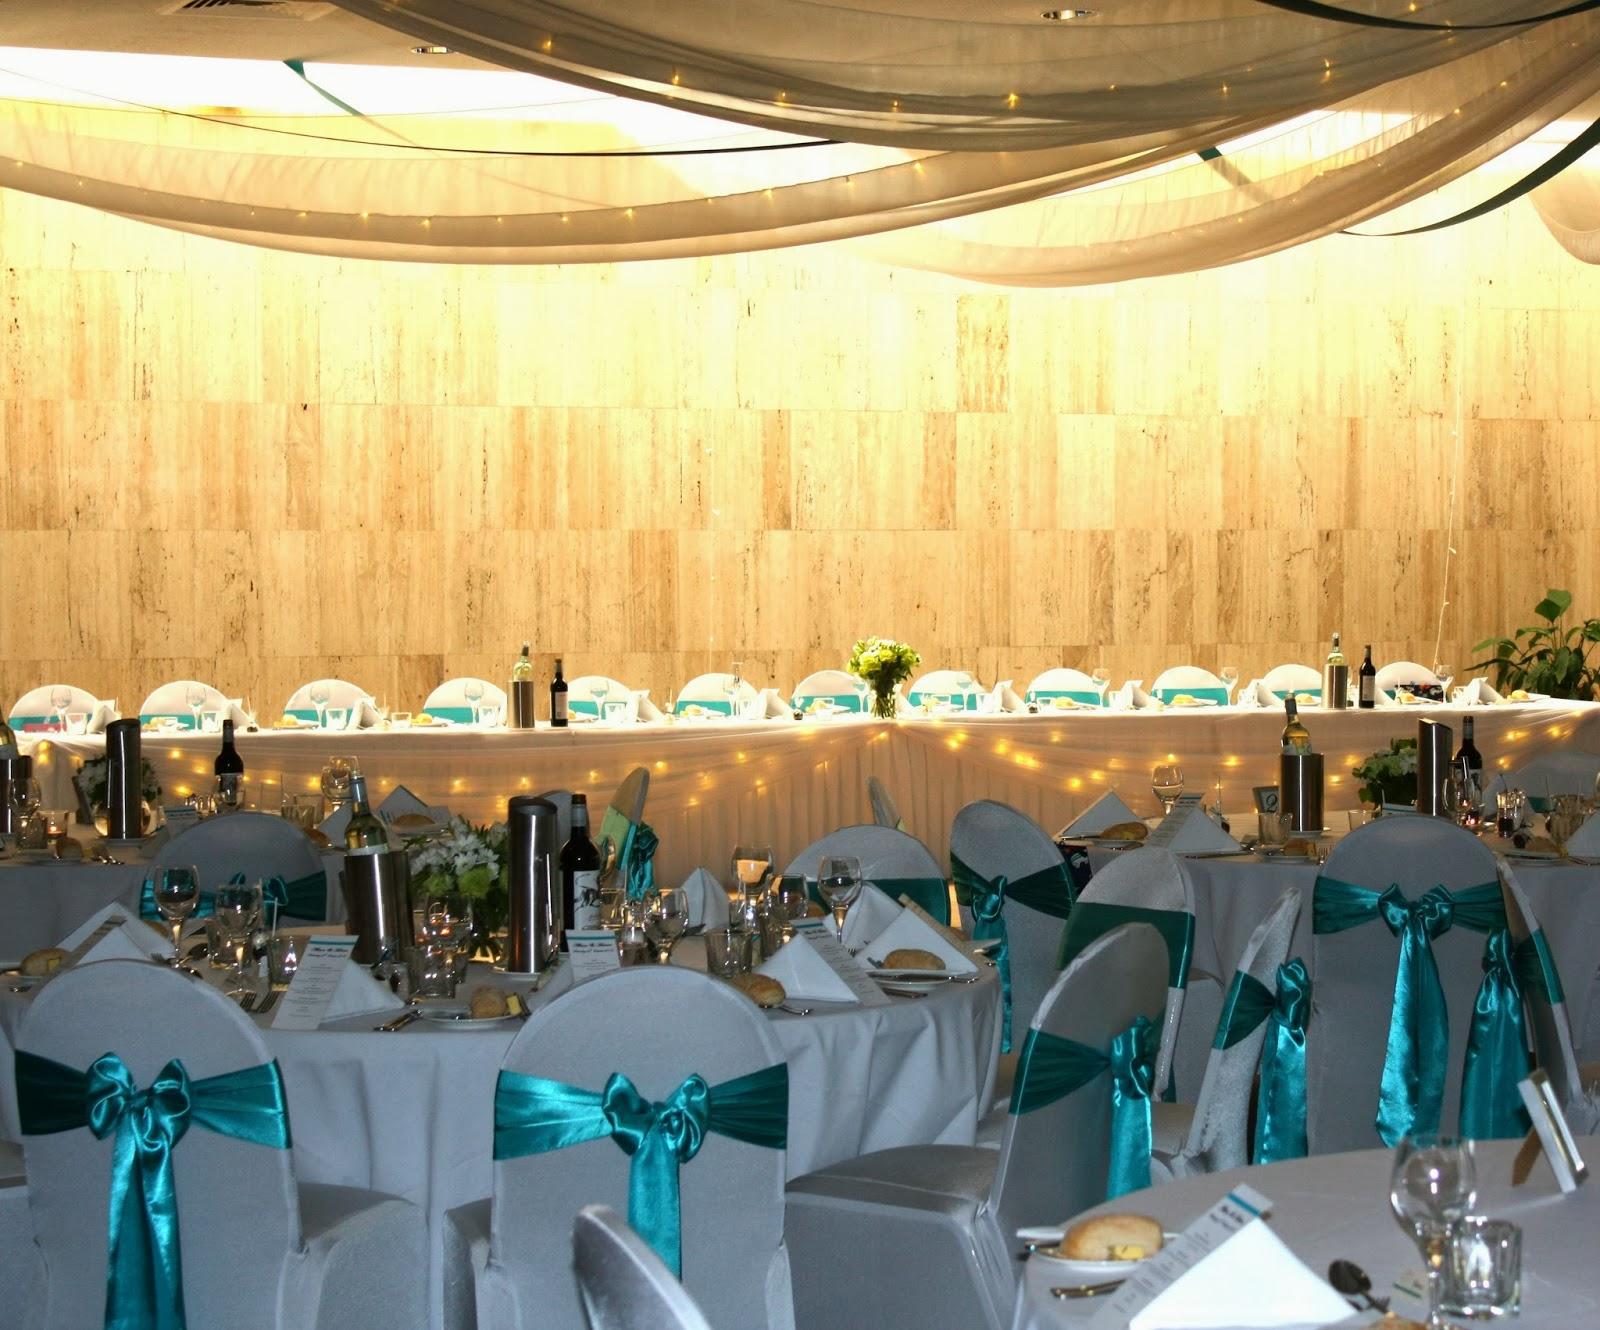 Charmant wedding decorators canberra galerie brautkleider ideen new wedding reception decoration hire wollongong wedding junglespirit Choice Image